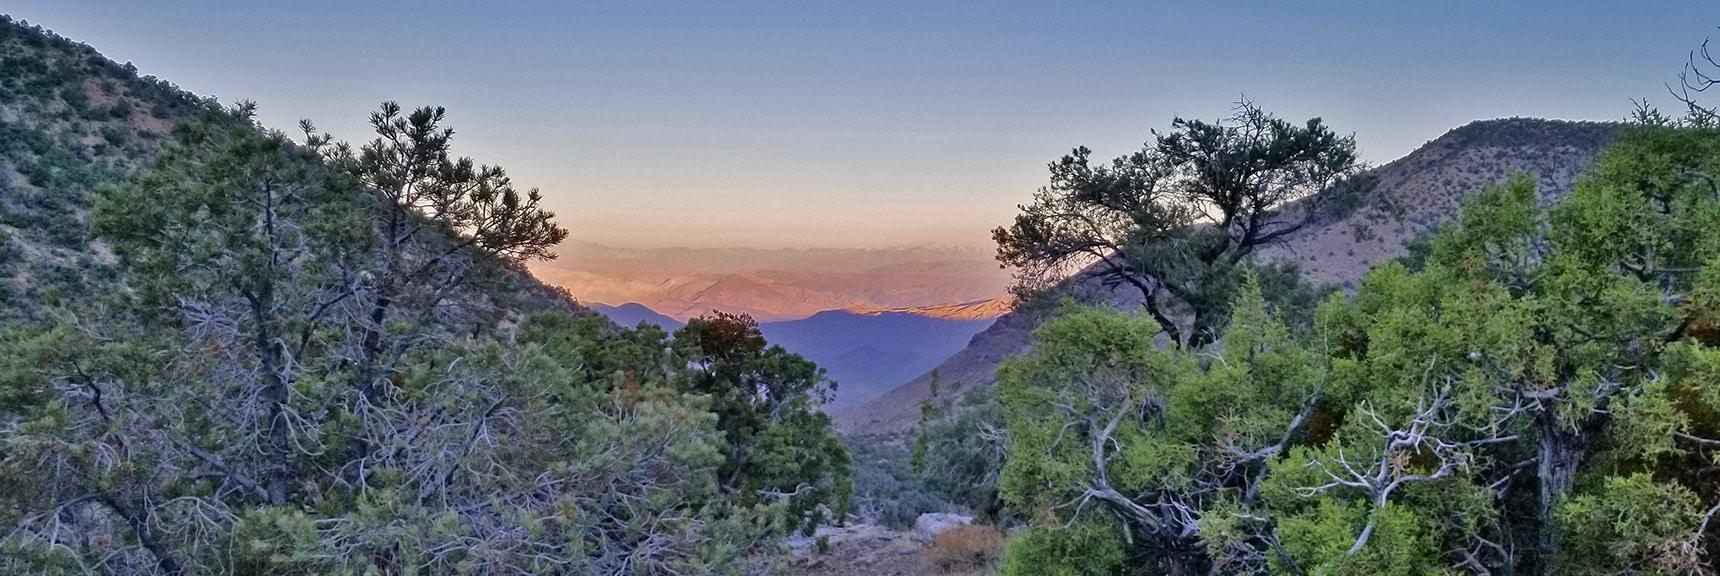 View Back Down Canyon Trail Approach to Panamint Range Summit Ridge   Wildrose Peak   Panamint Mountain Range   Death Valley National Park, California